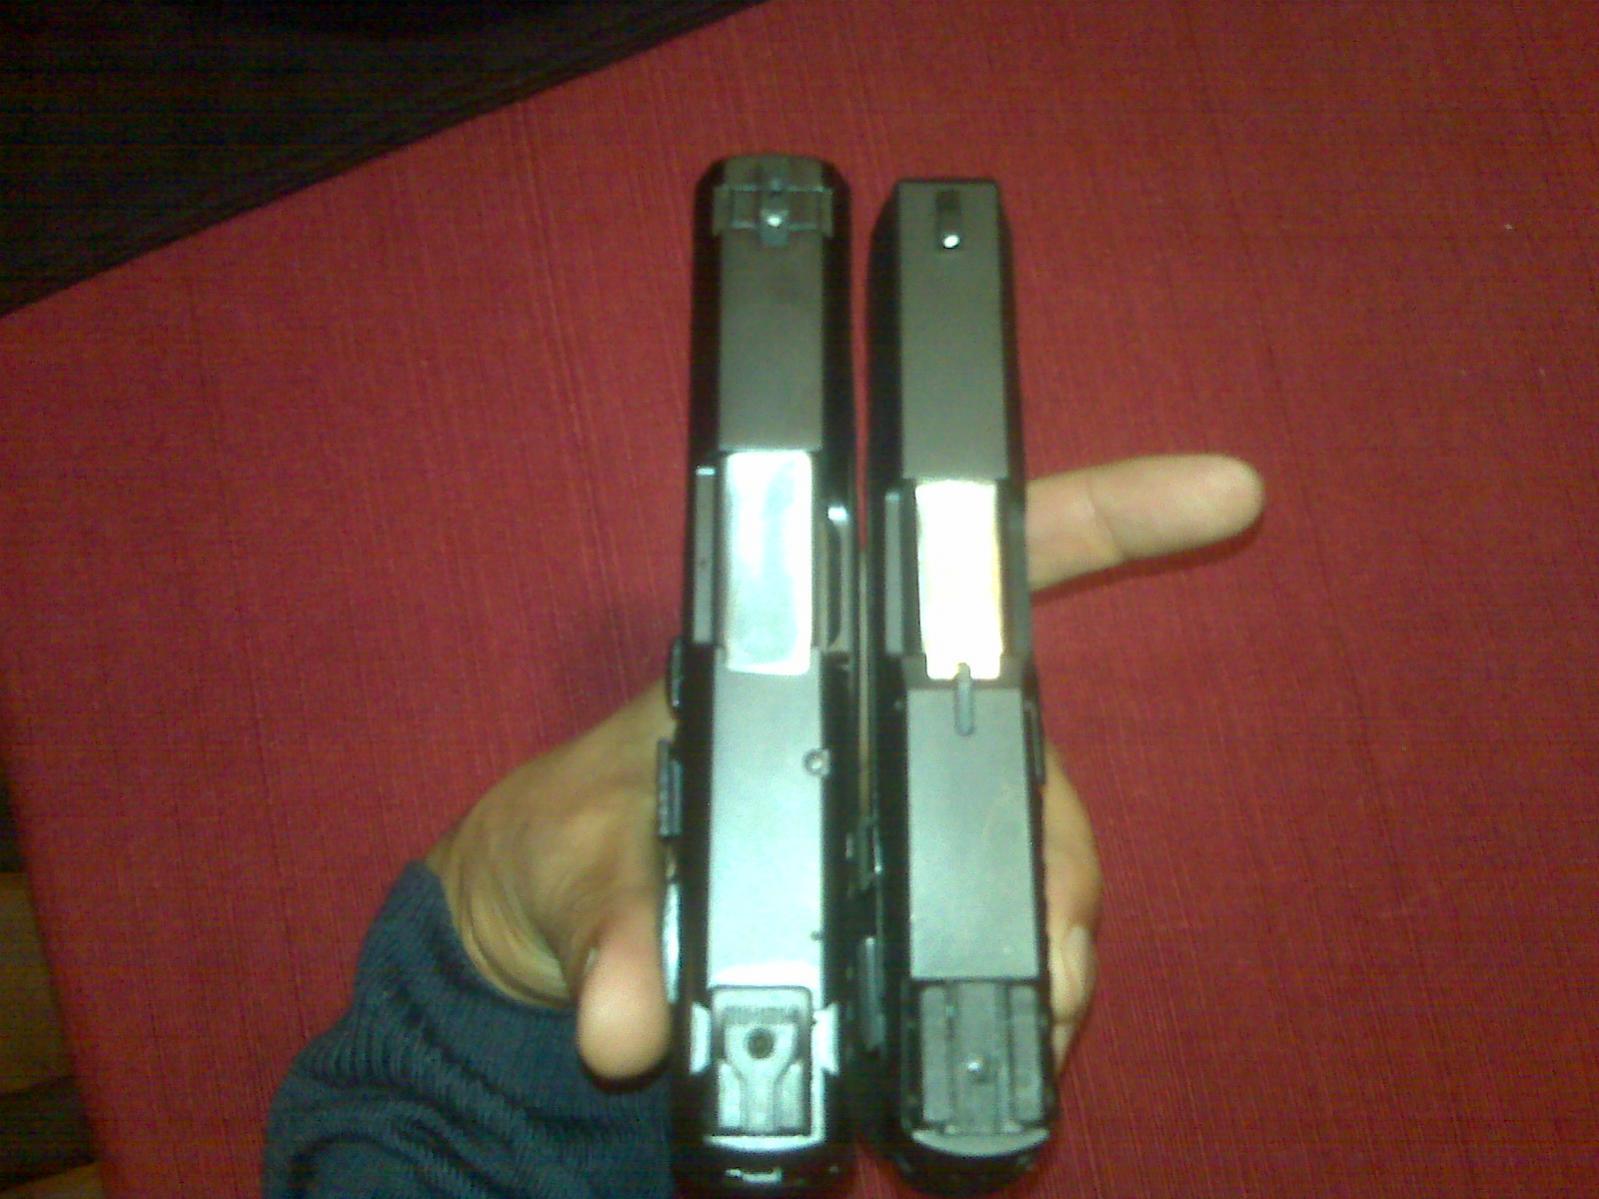 Bought a new pistol-img00143.jpg